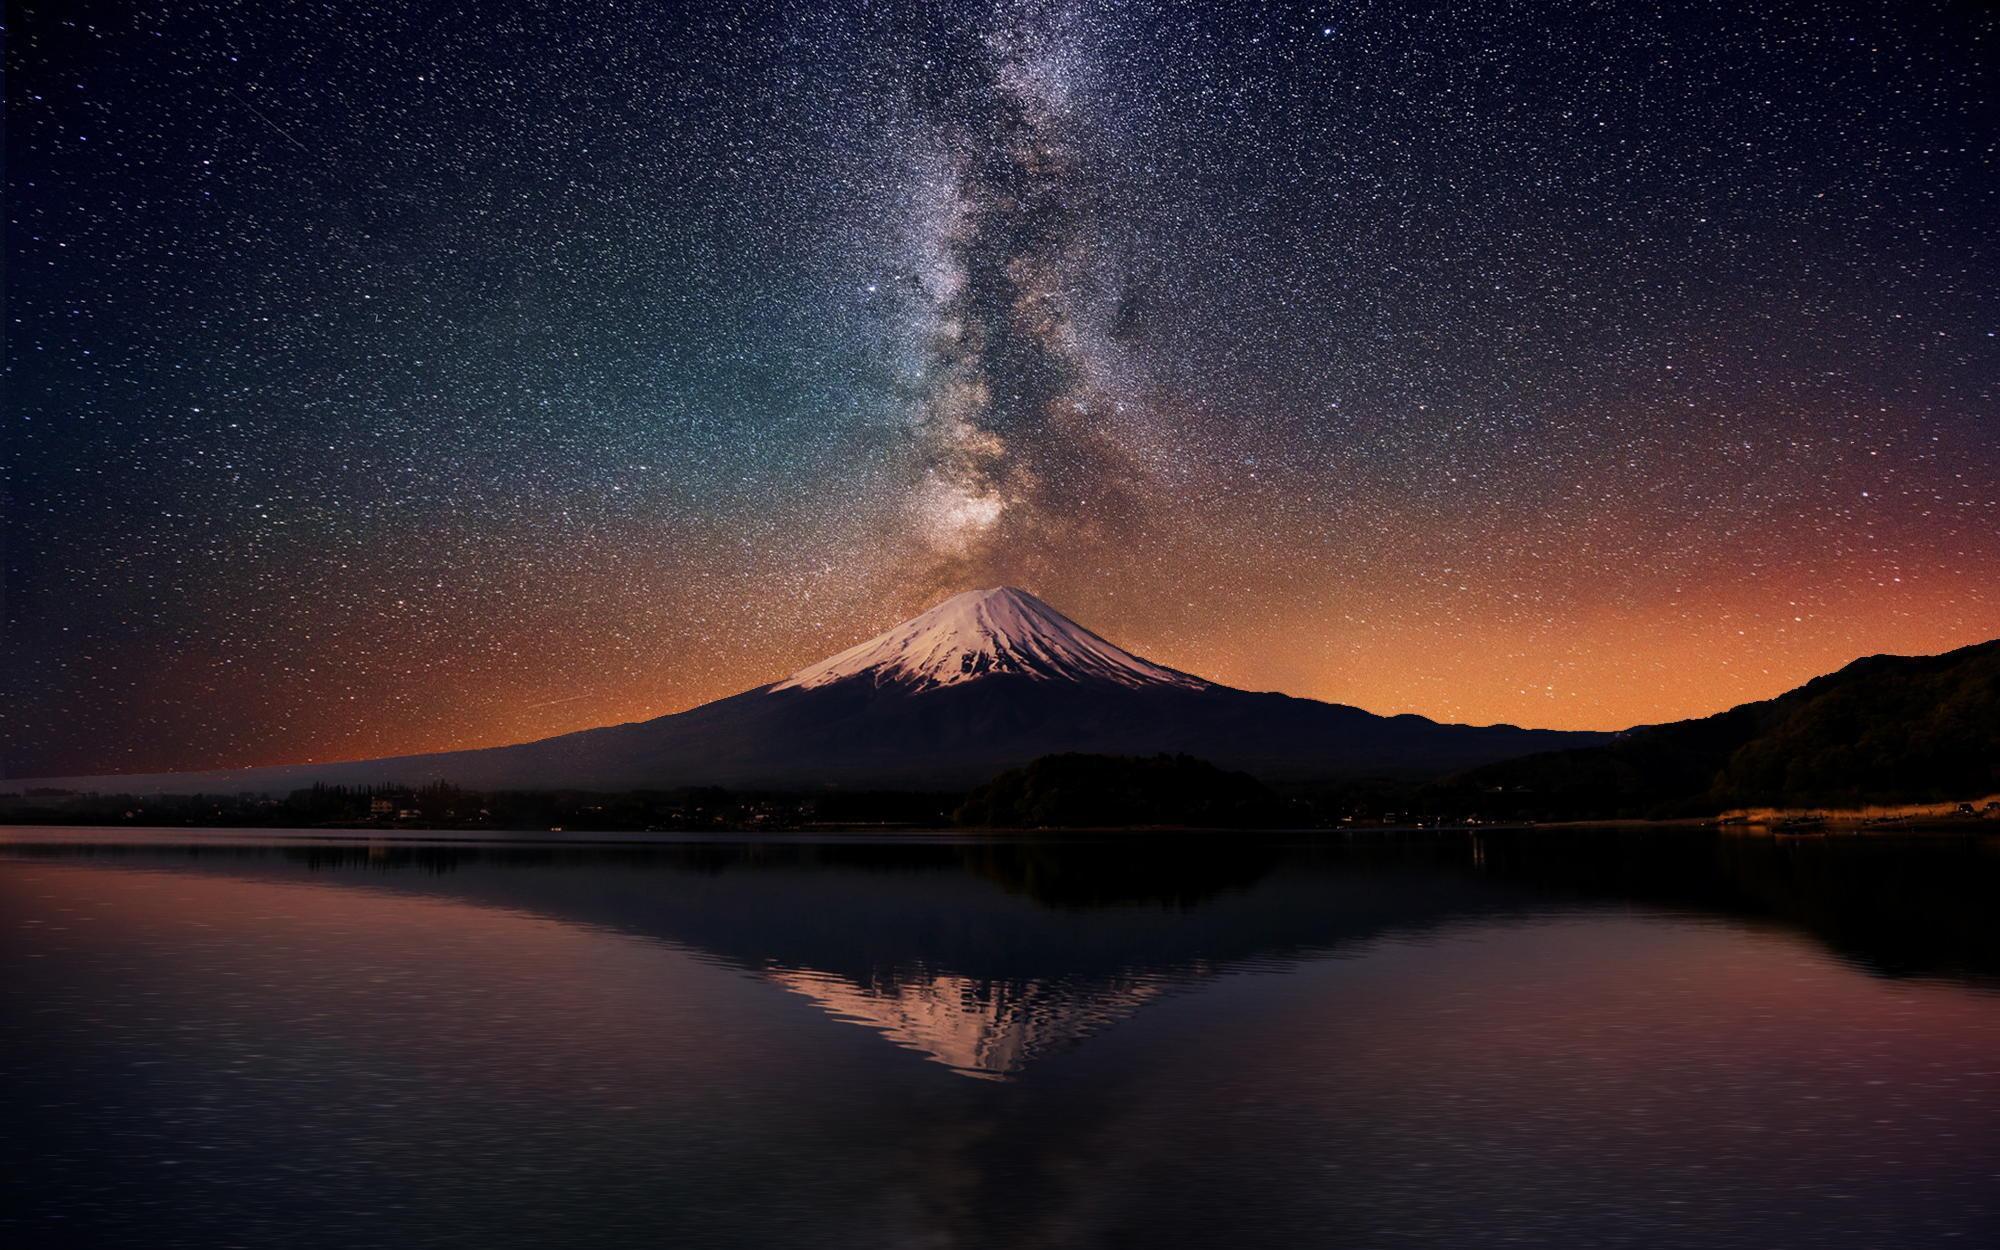 2932x2932 Firewatch Game Sunset Ipad Pro Retina Display Hd: Night Mount Fuji Wallpapers